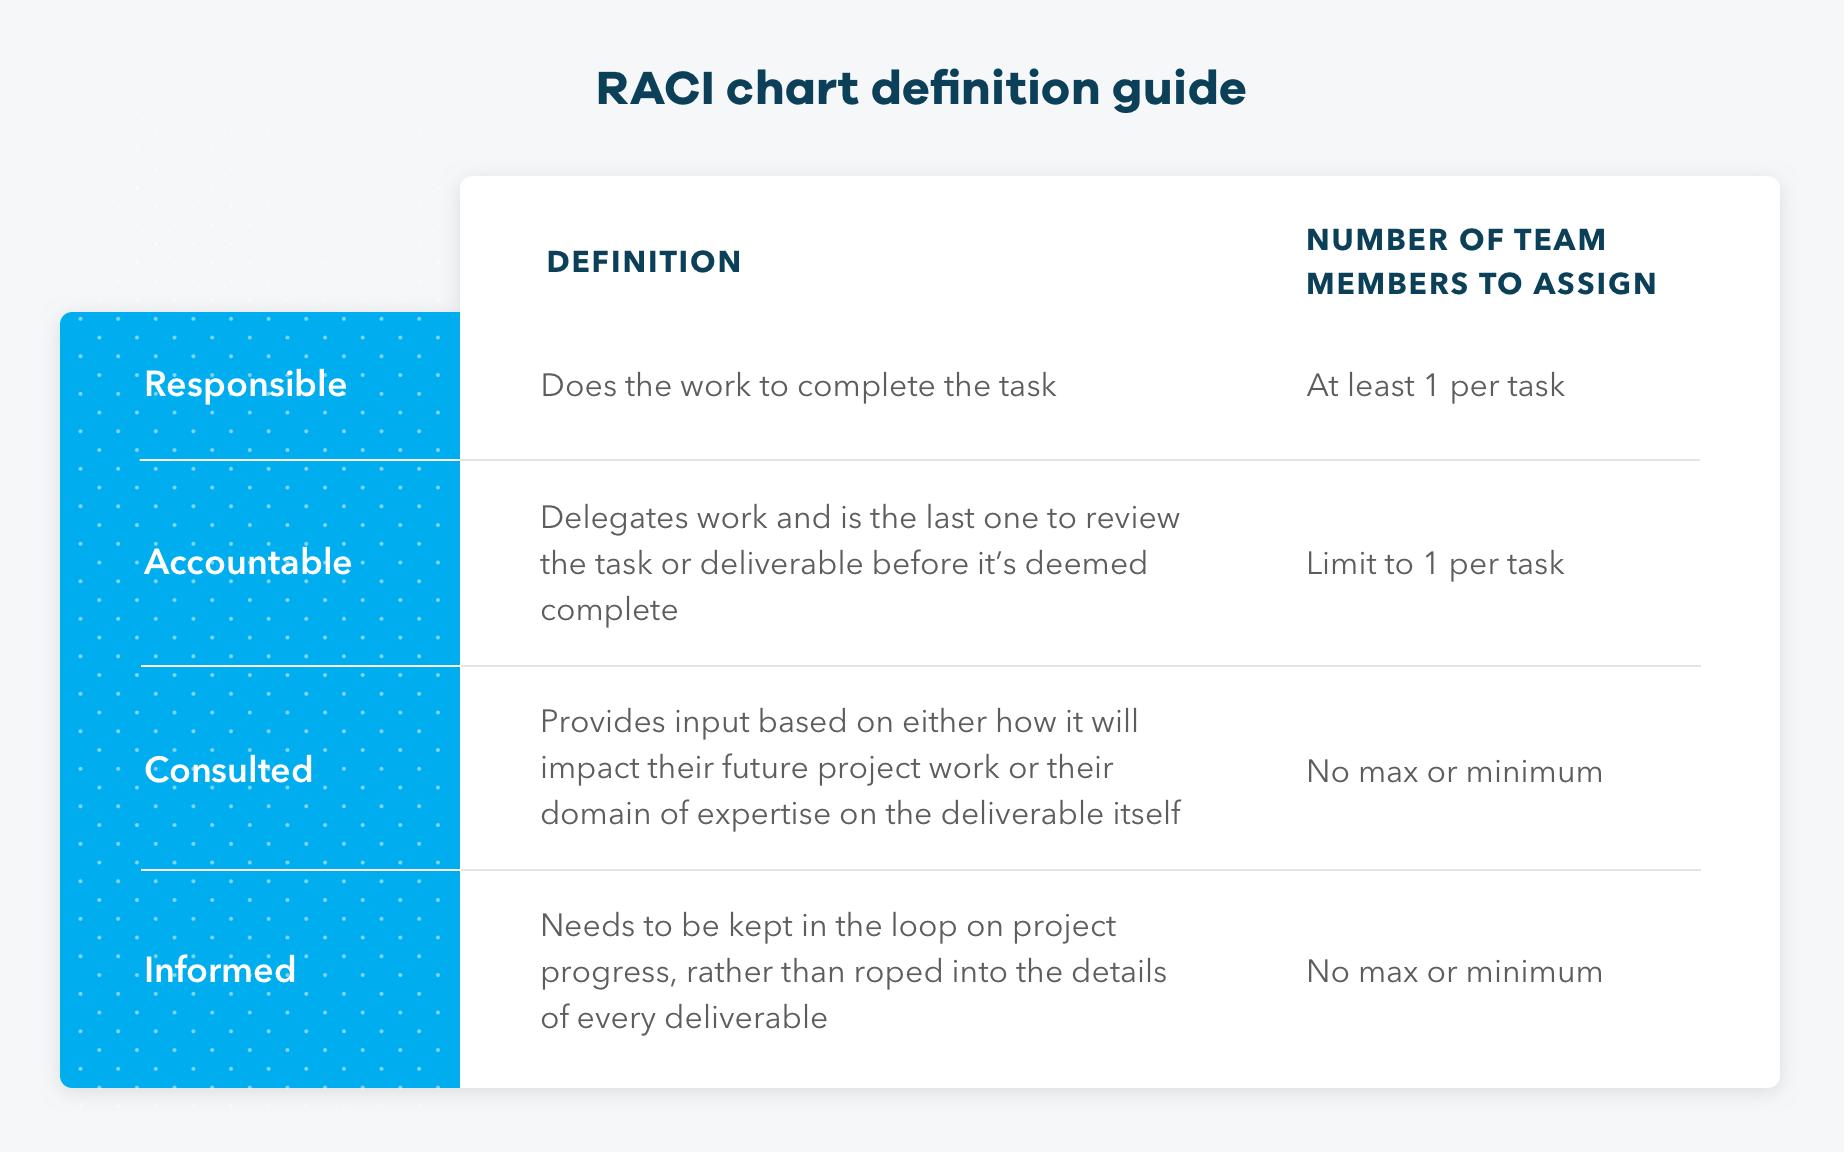 RACI chart definitions